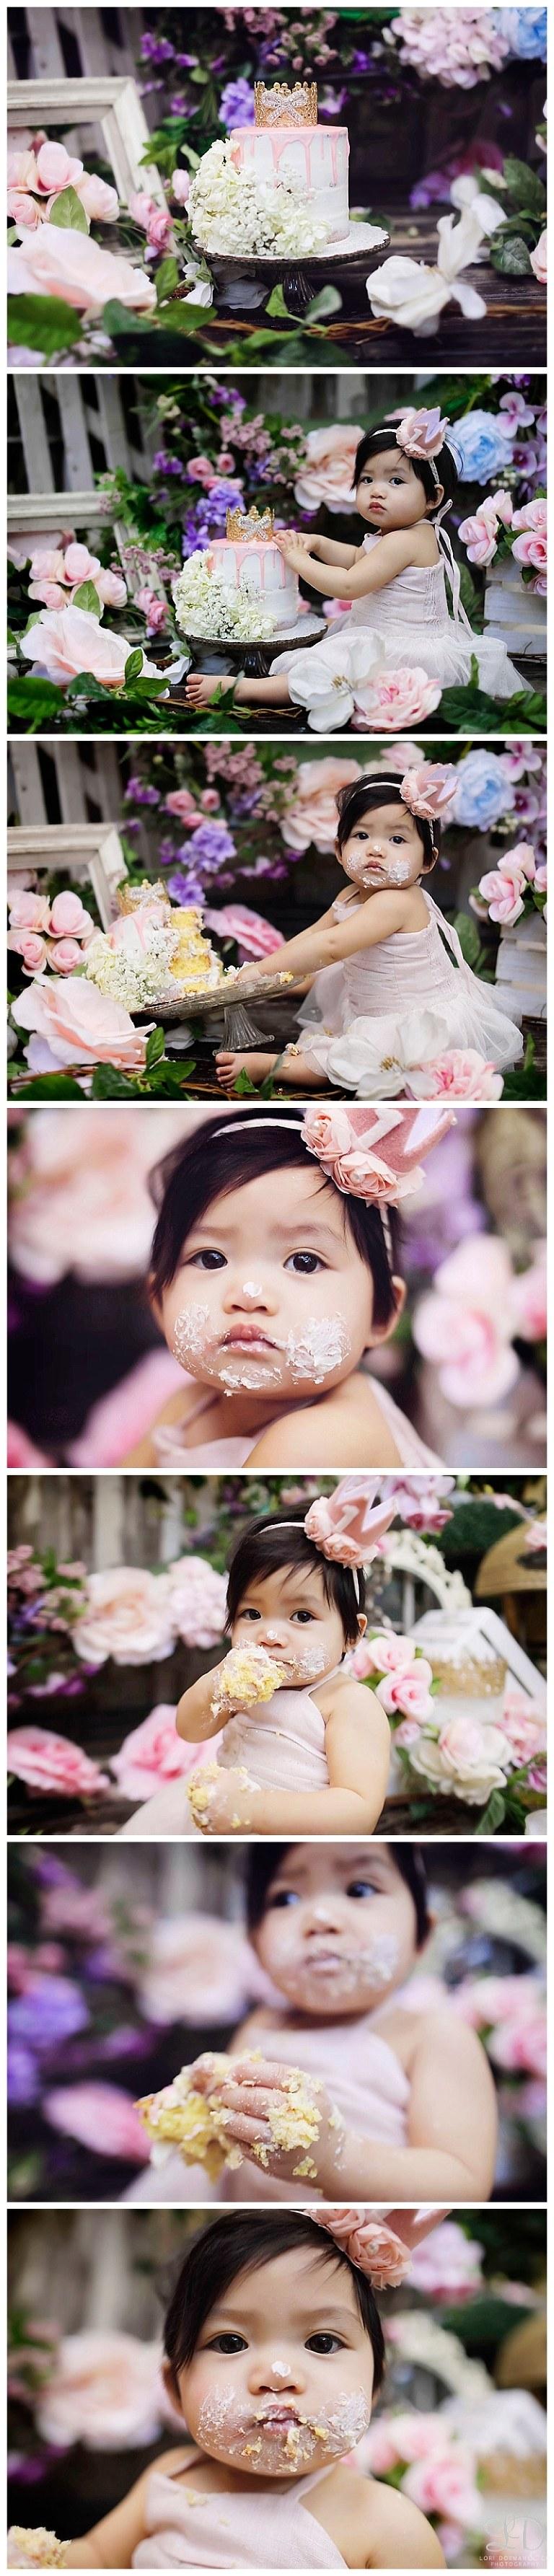 adorable family shoot-family photographer-children photographer-professional photographer-lori dorman photograpy_1284.jpg